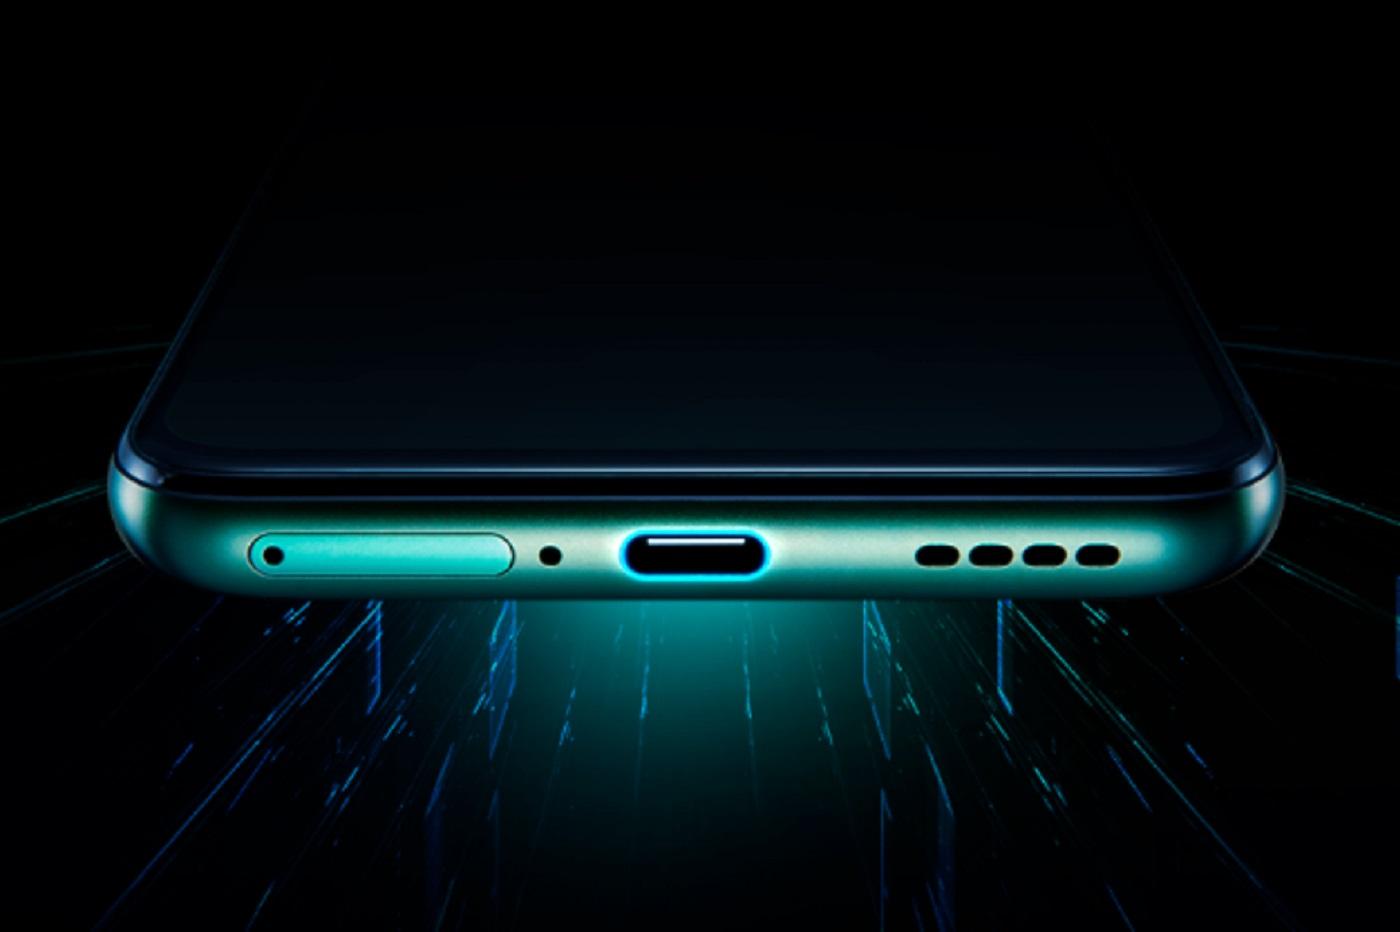 Teasing du Realme X50 Pro 5G